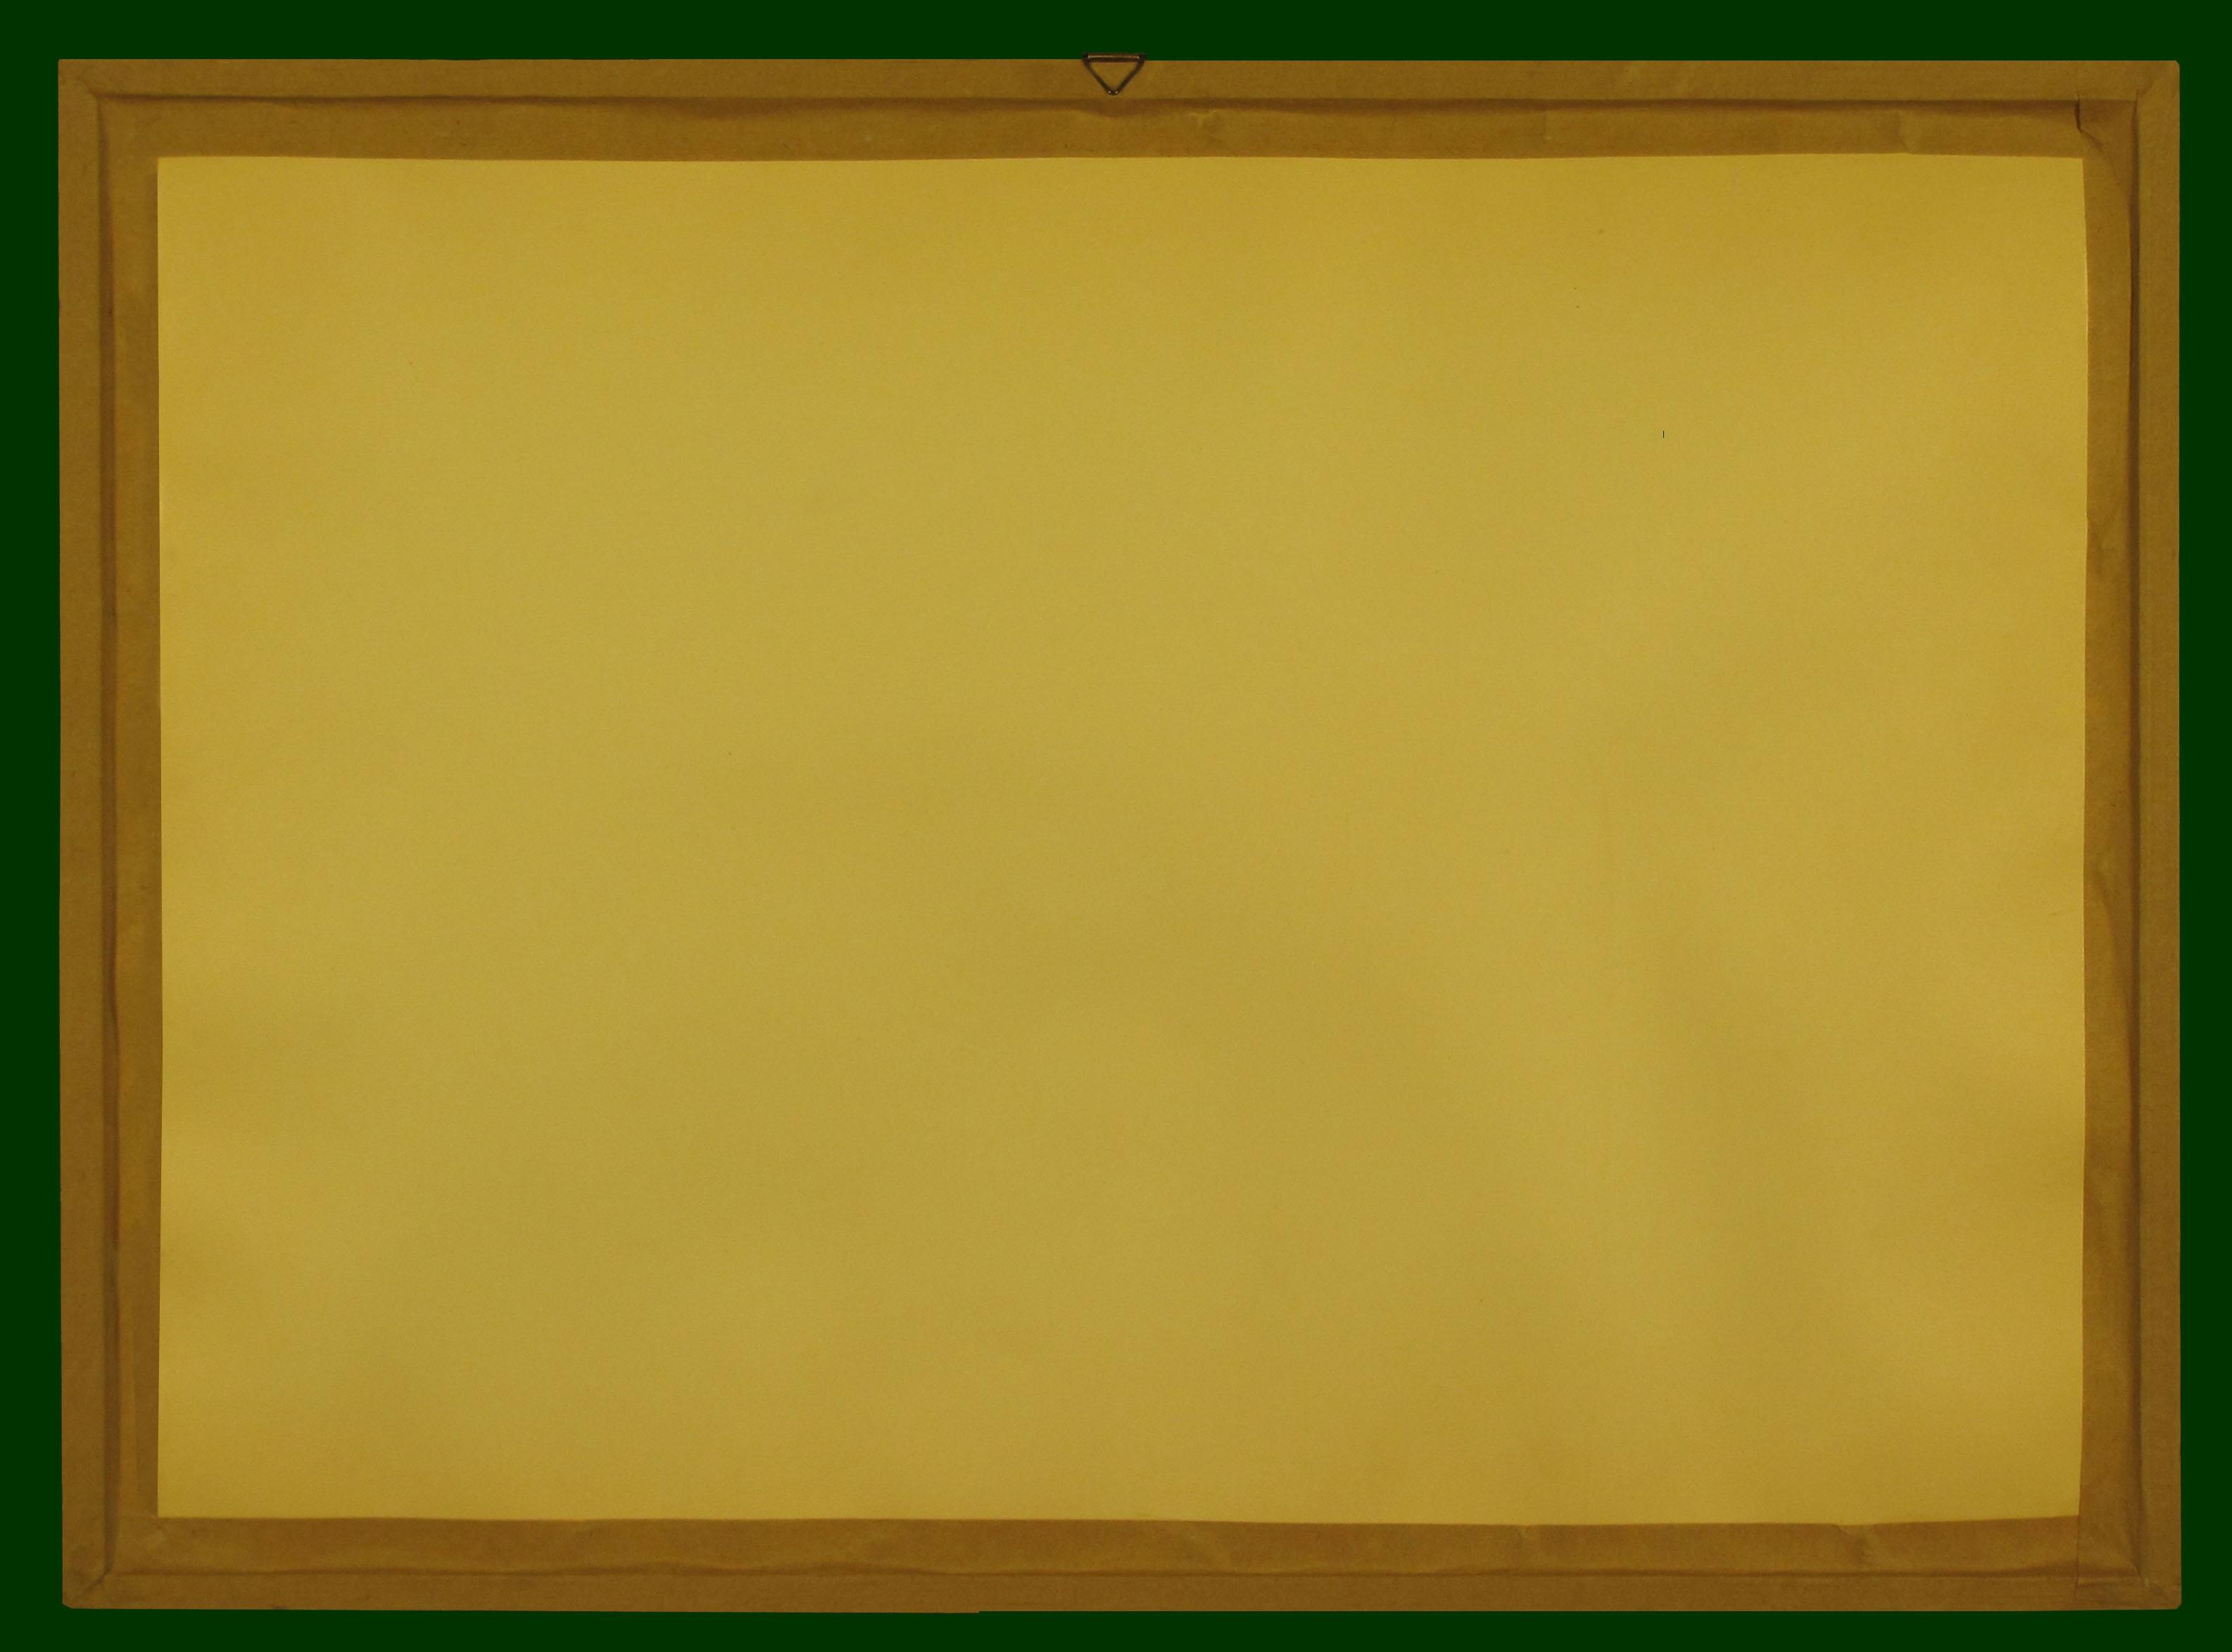 48-5 h_t.jpg (3171�2347)